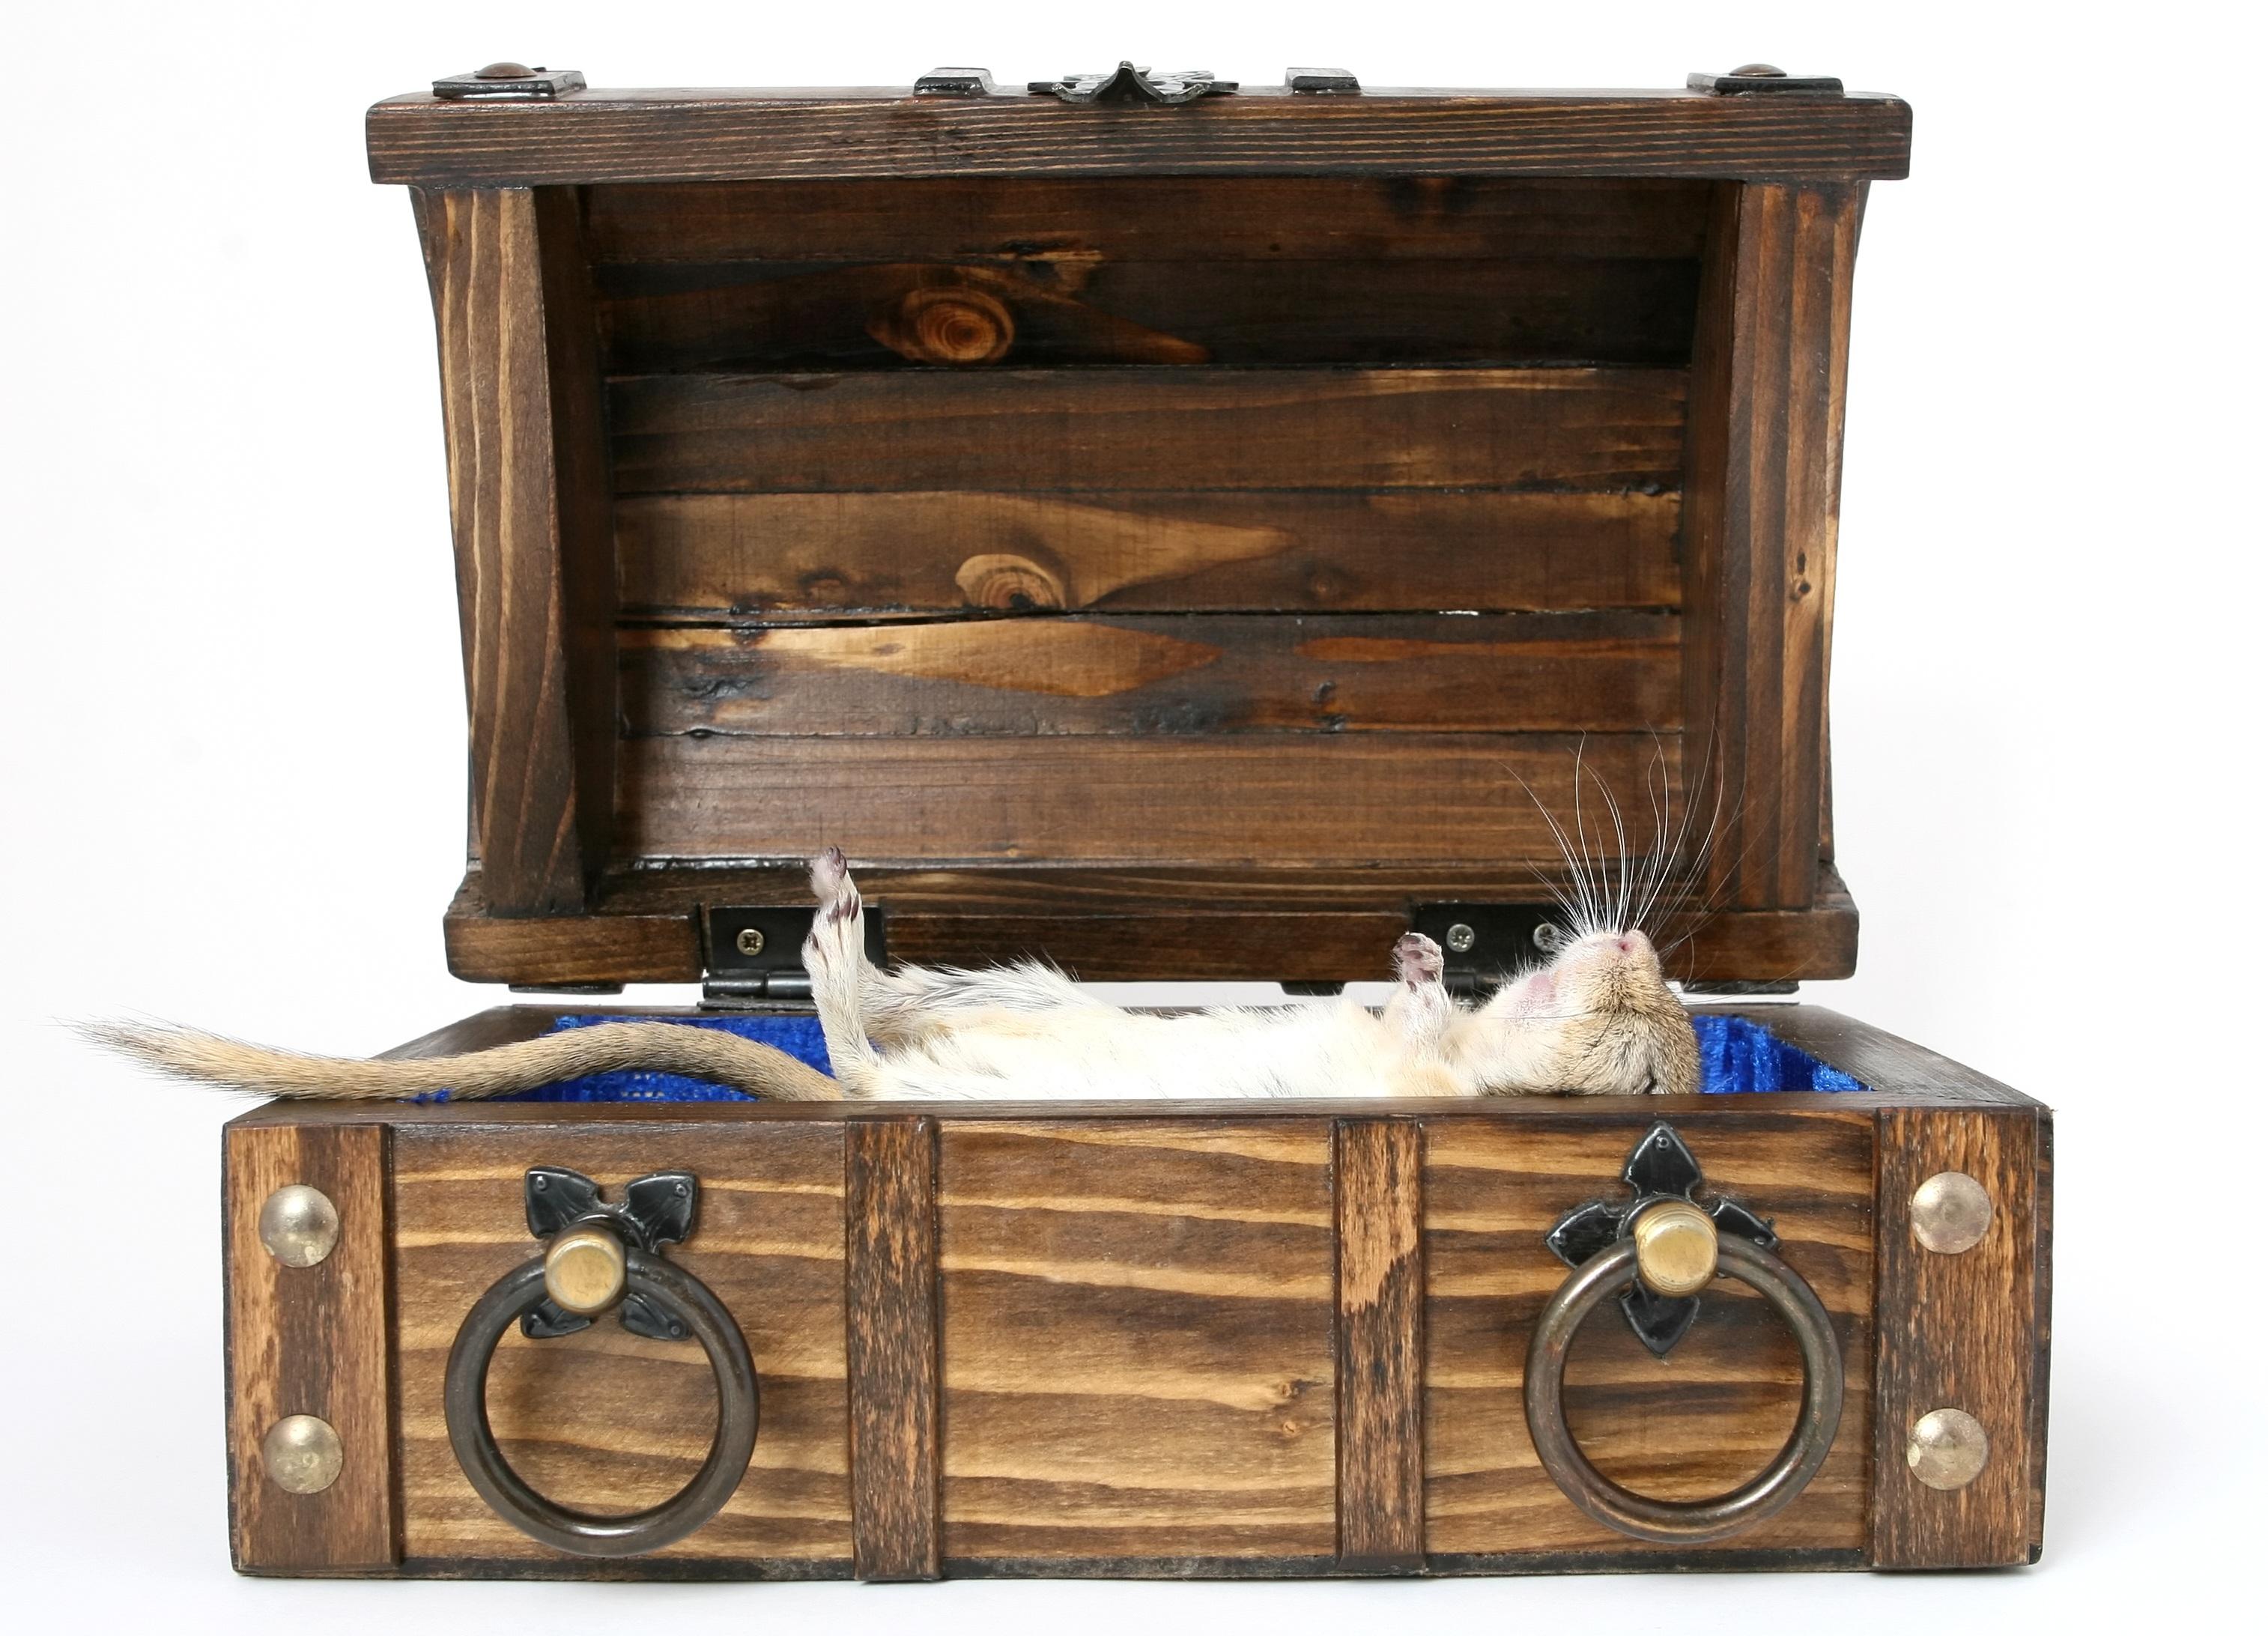 dresser leather suitcase room chs vintagelug with bed luggage vintage chest furniture brisbane drawers